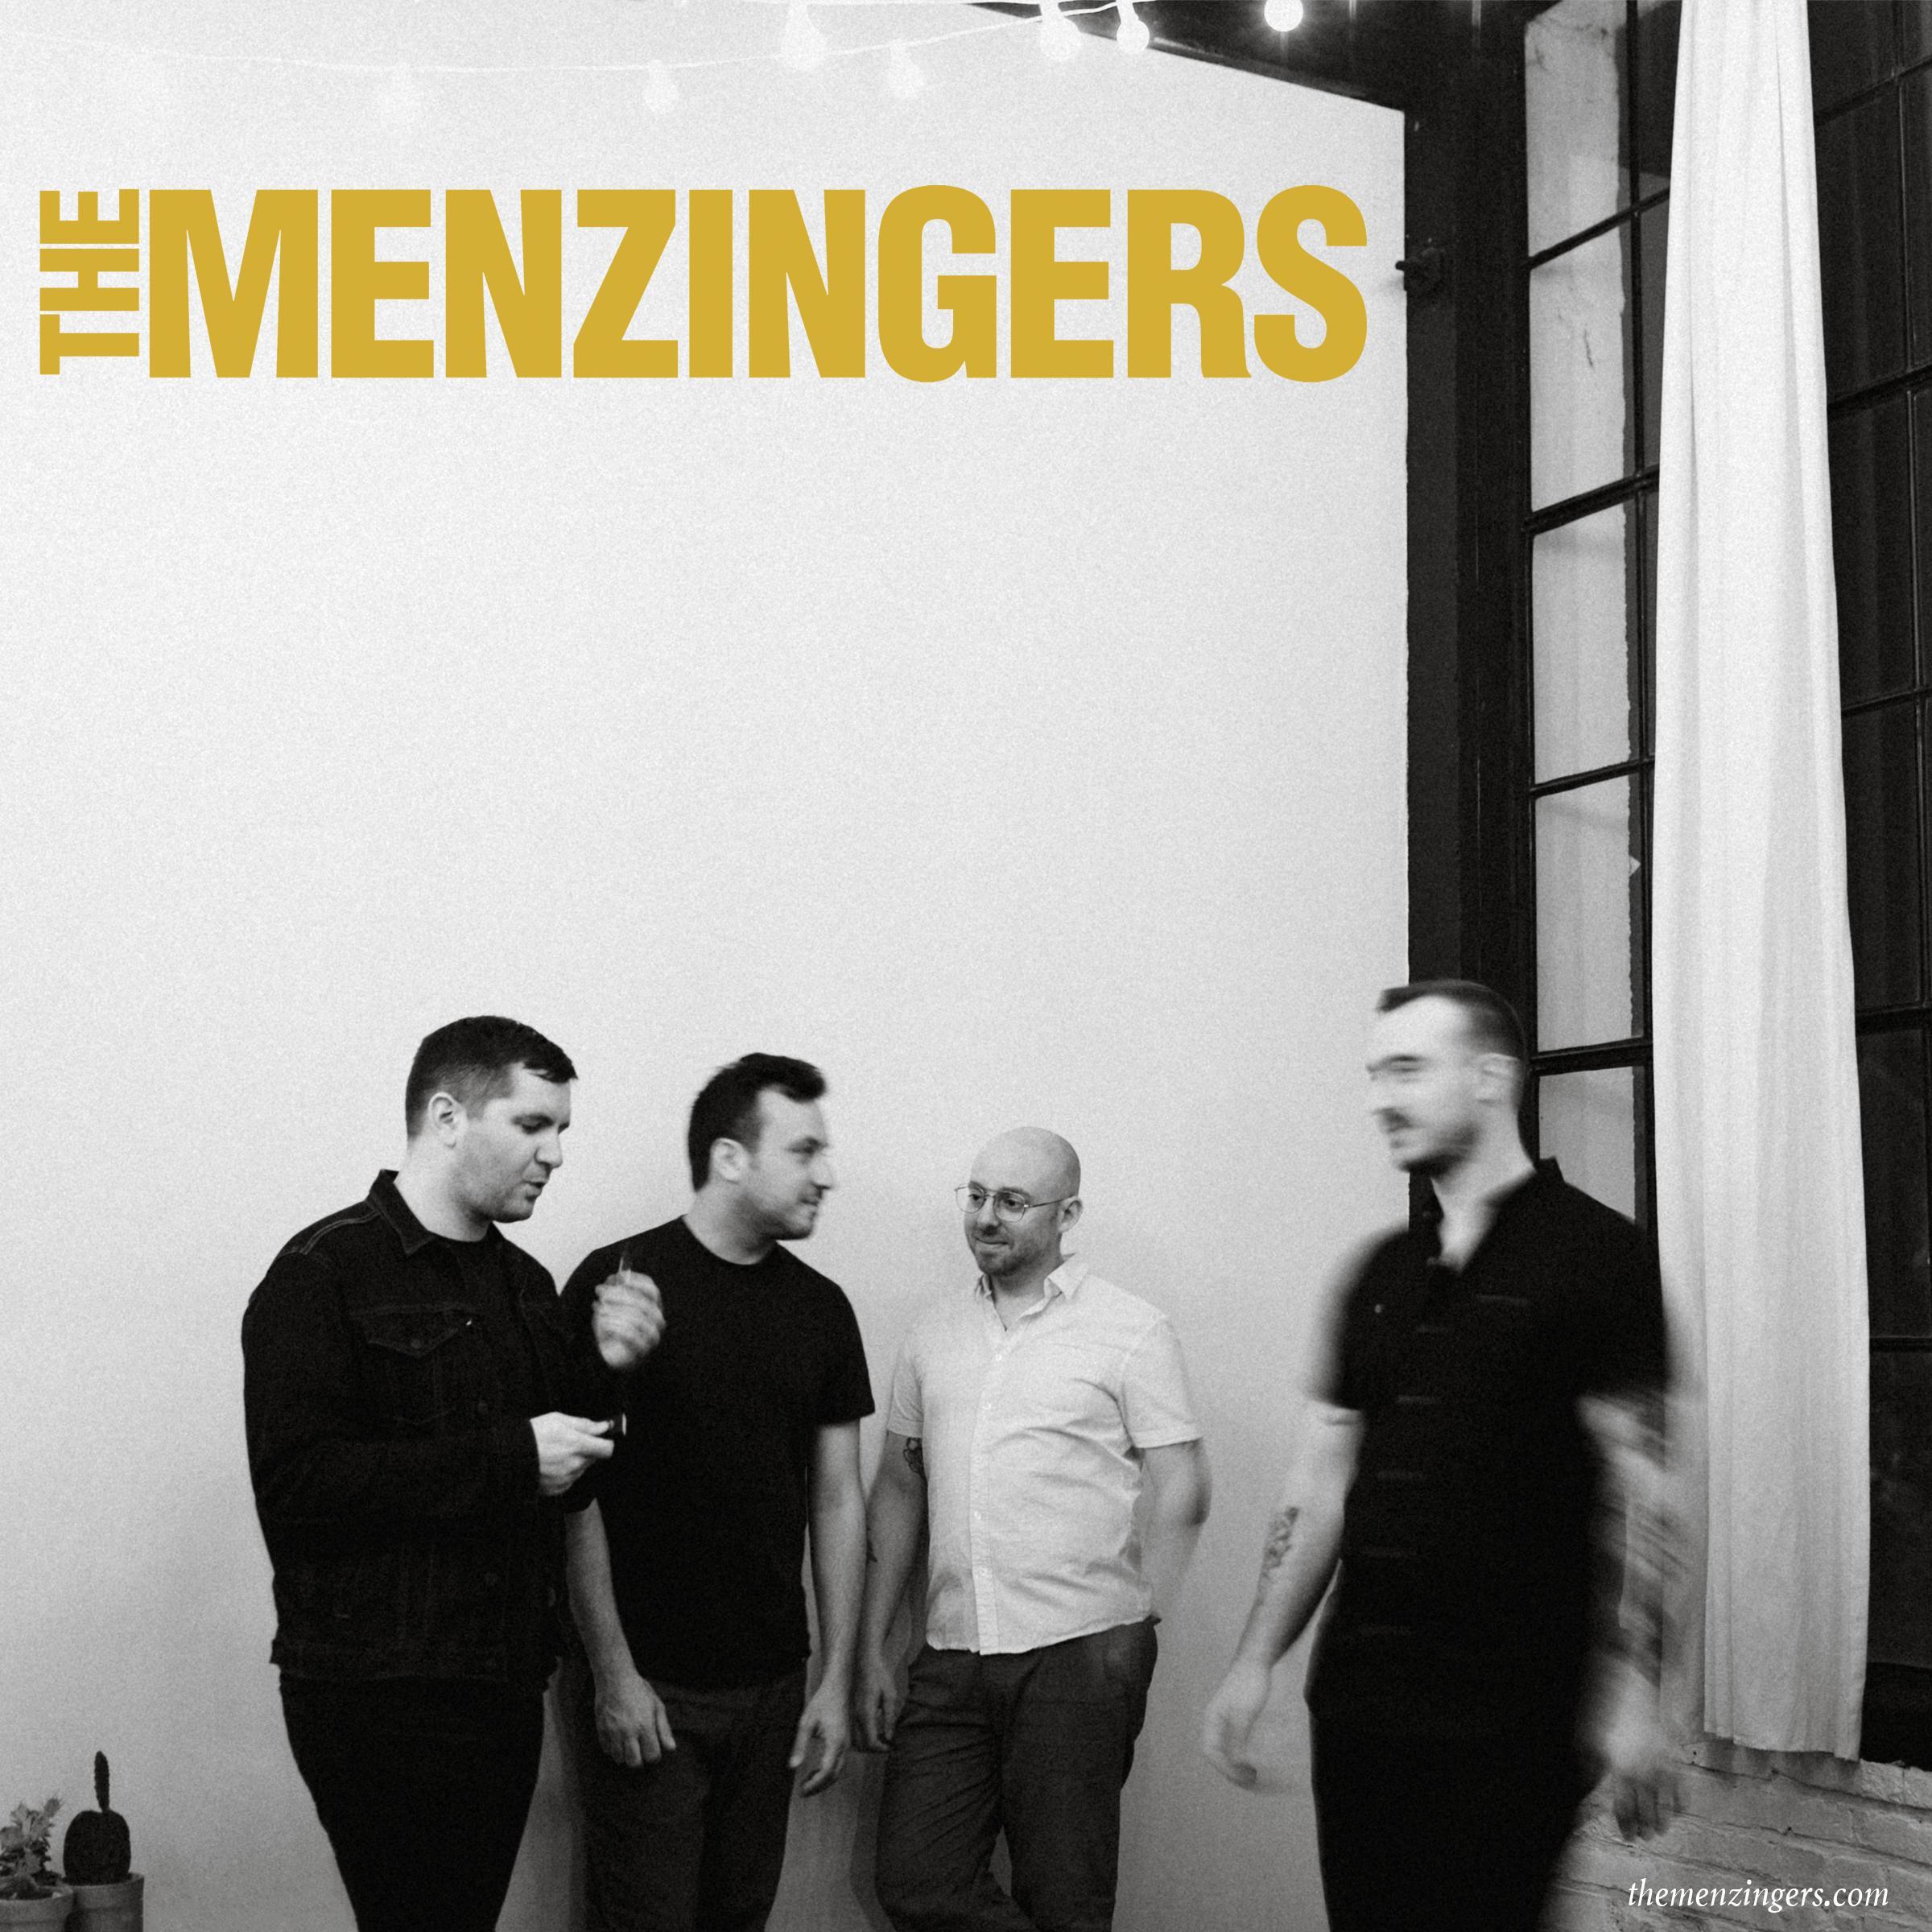 The Menzingers (POSTPONED)